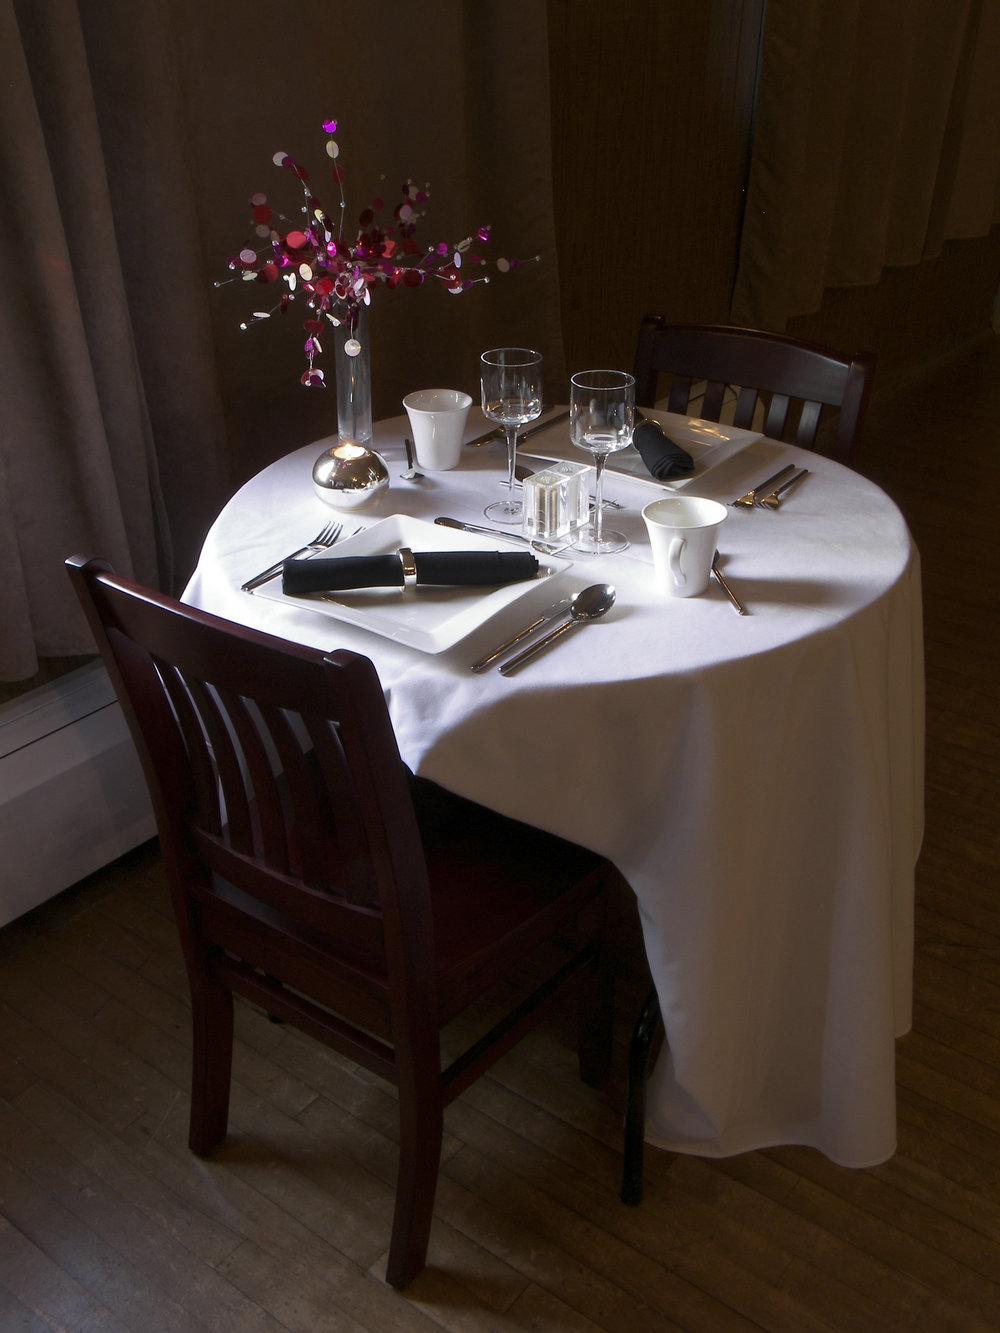 PRE-SHOW DINING